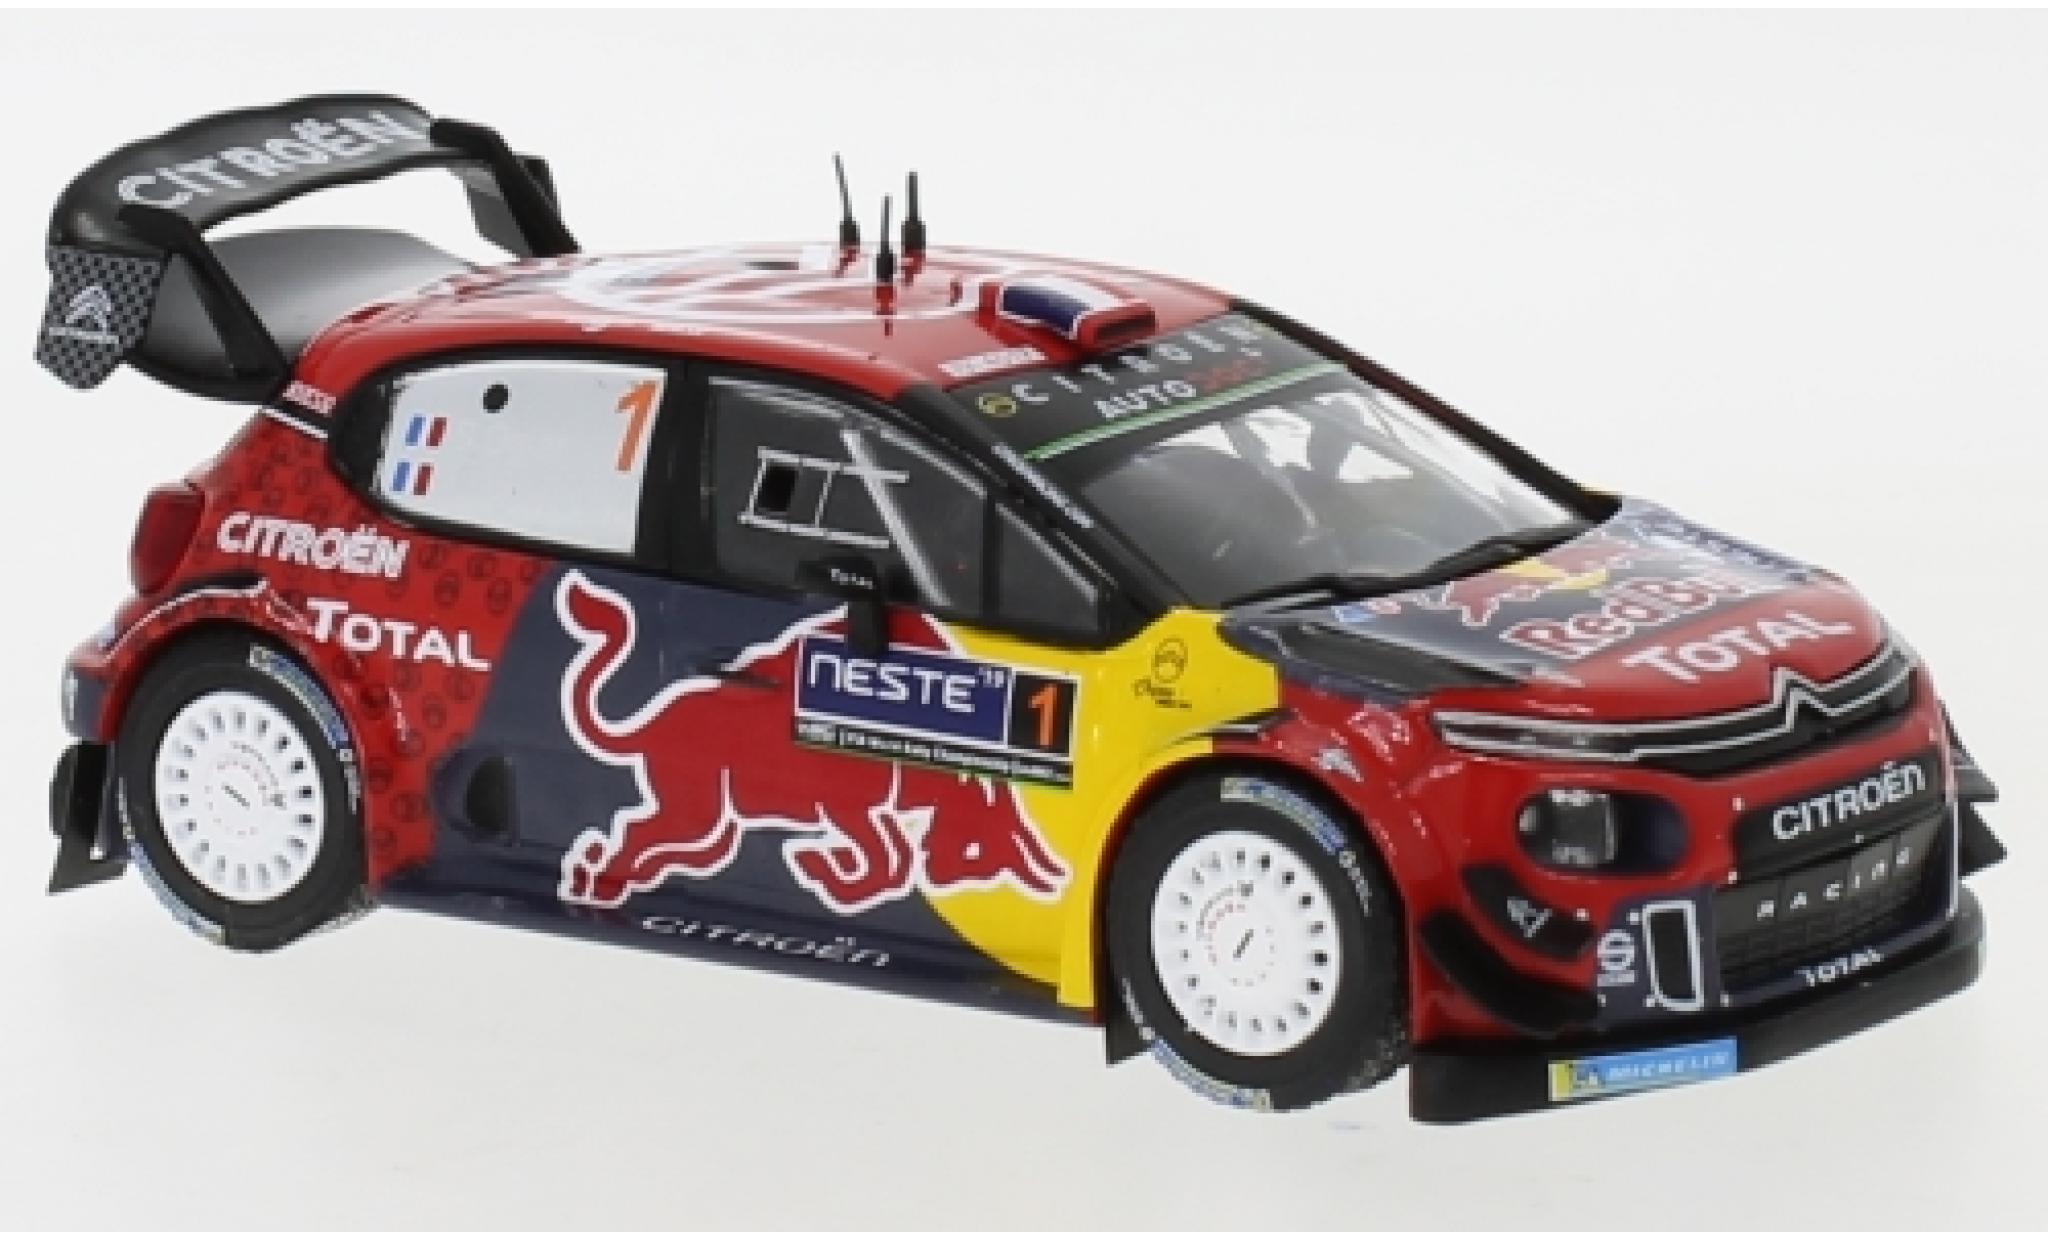 Citroen C3 1/43 IXO WRC No.1 Red Bull WRC Rallye Finnland 2019 S.Ogier/J.Ingrassia